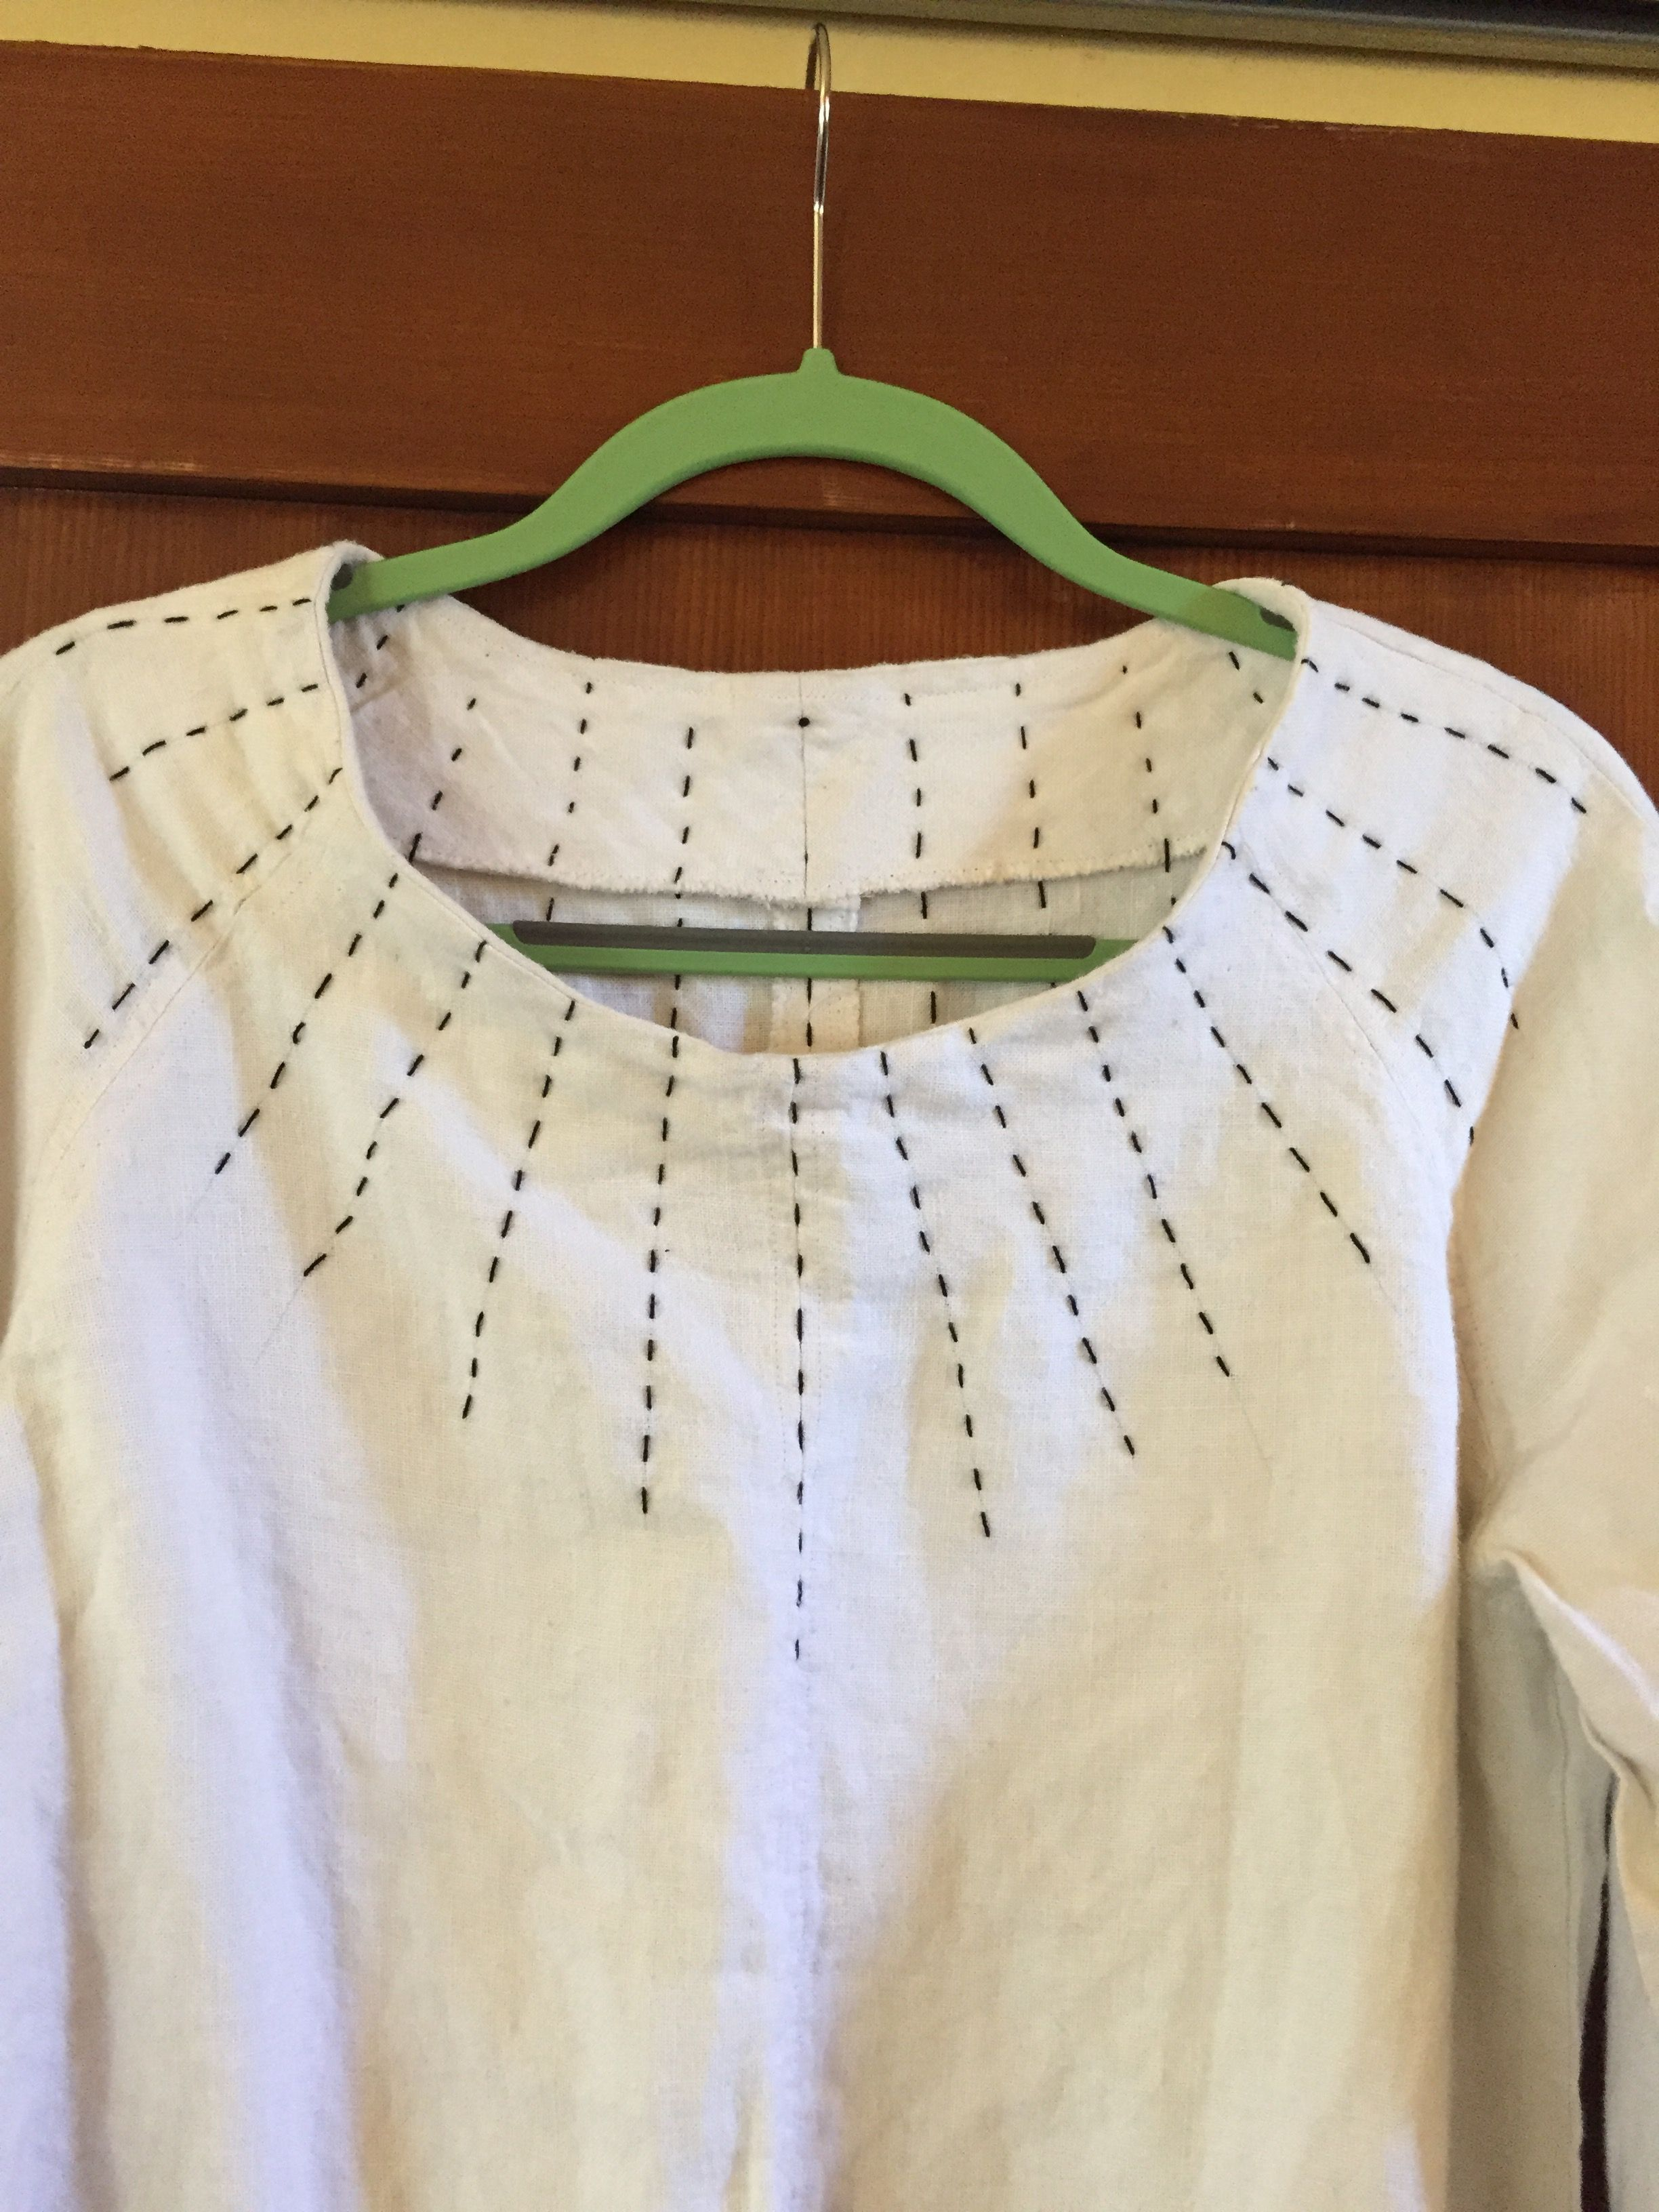 Pin de Shruti Thakkar en tops | Pinterest | Bordado, Costura y Ropa